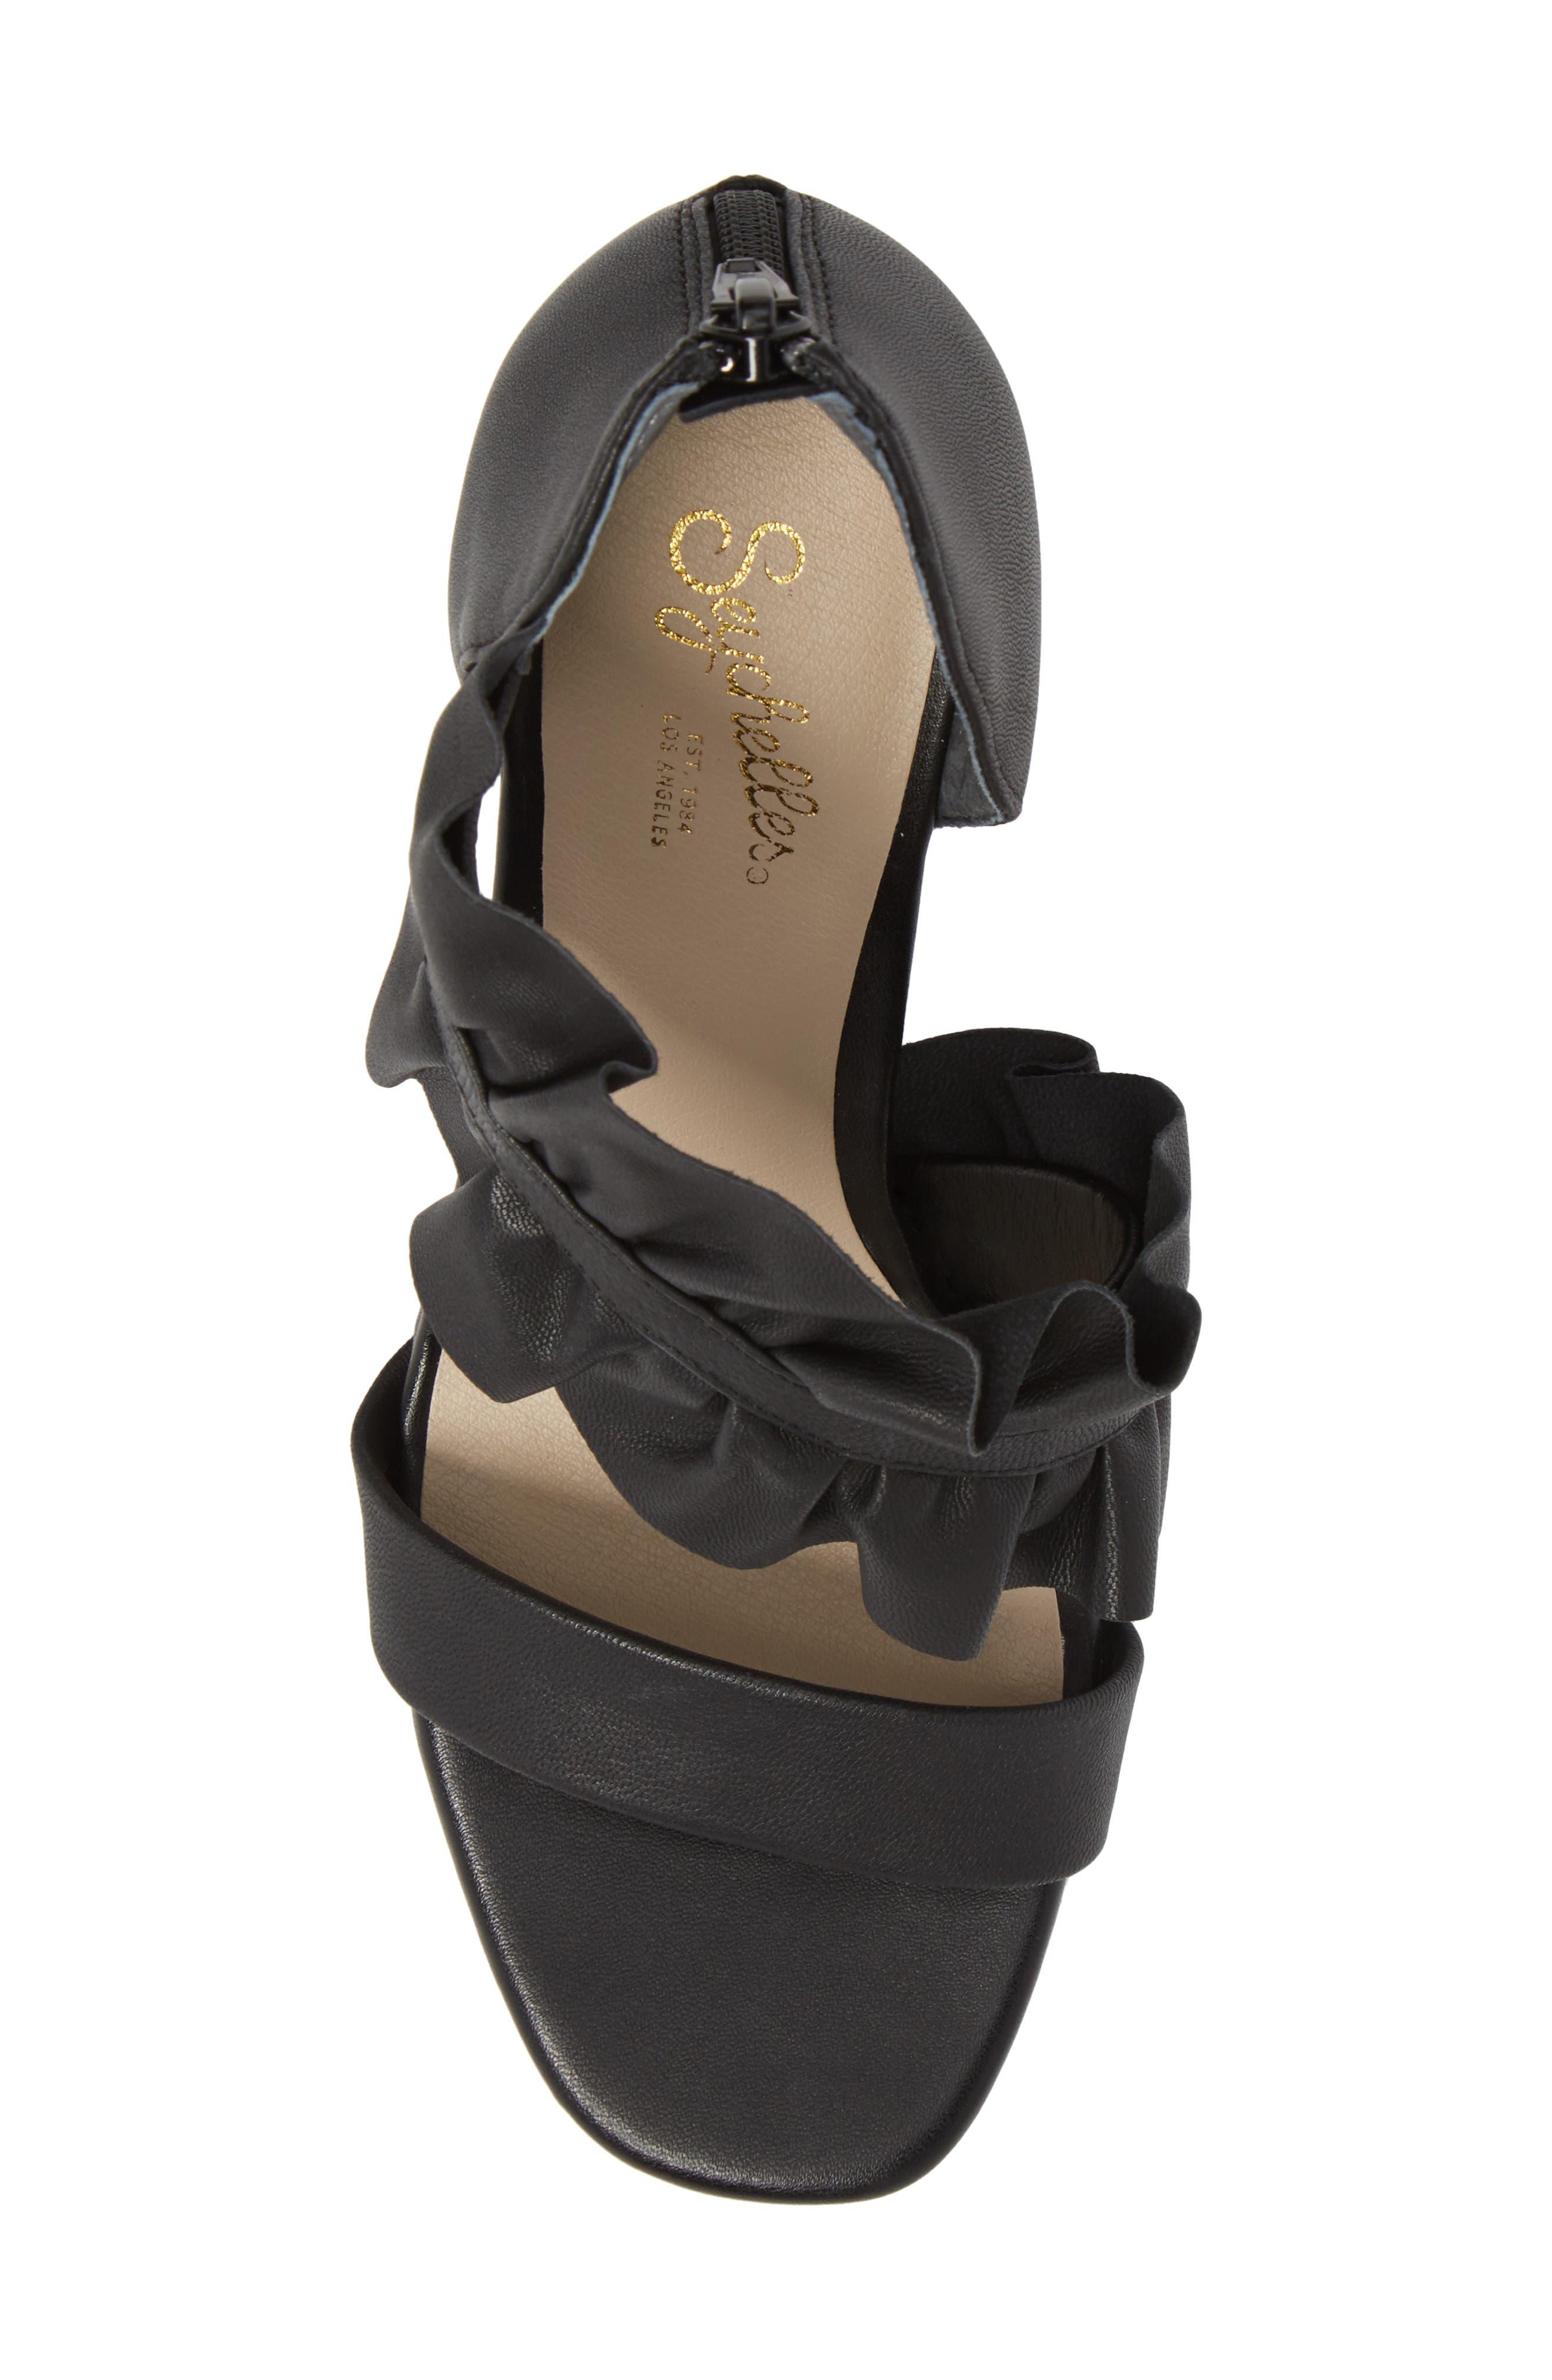 To-Do List Sandal,                             Alternate thumbnail 5, color,                             Black Leather